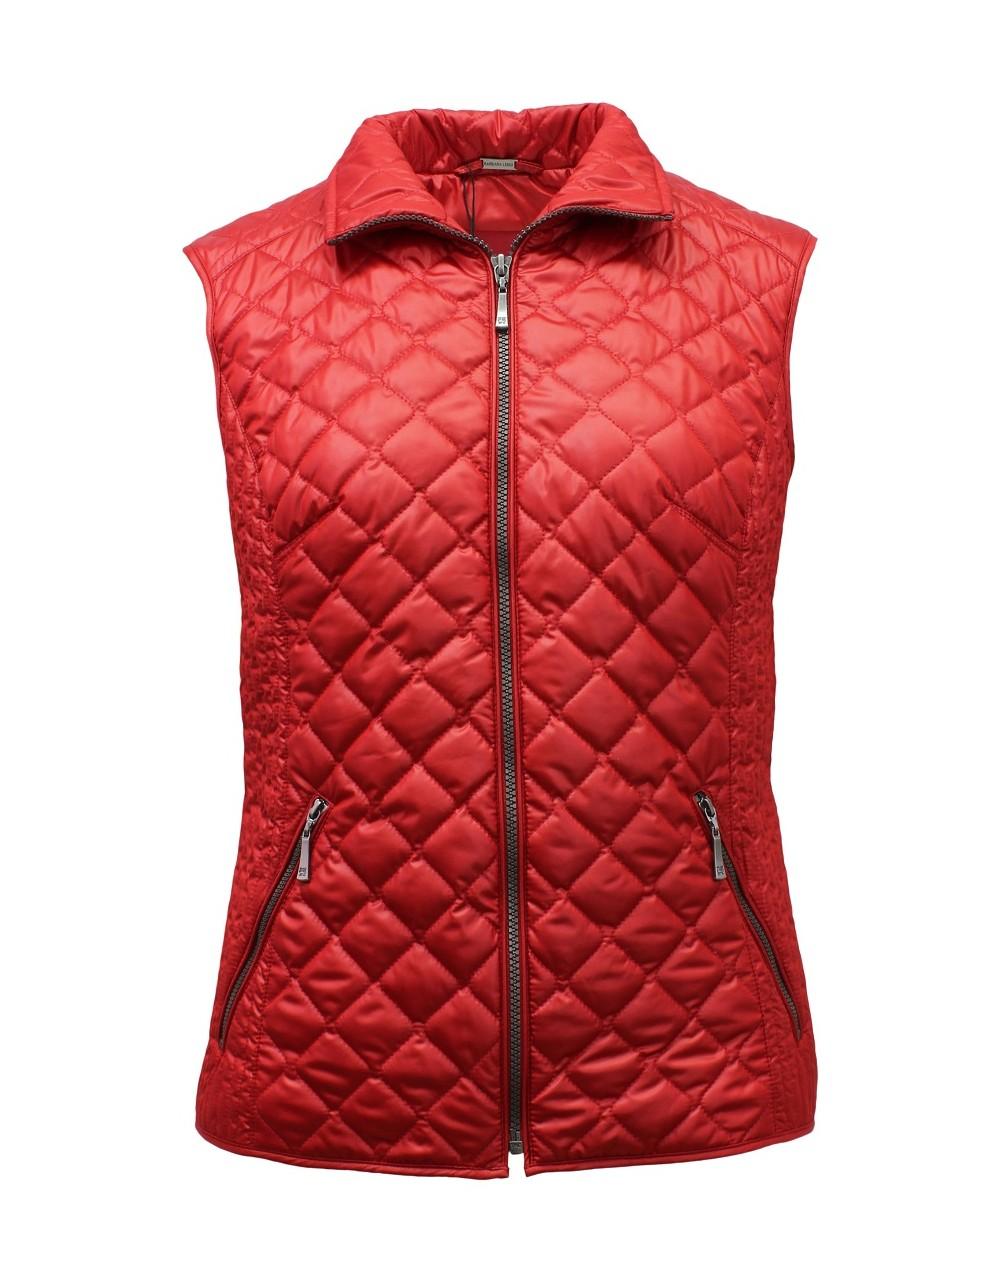 Barbara Lebek Gilet Outerwear Jackets and Gilets Irish Handcrafts -1